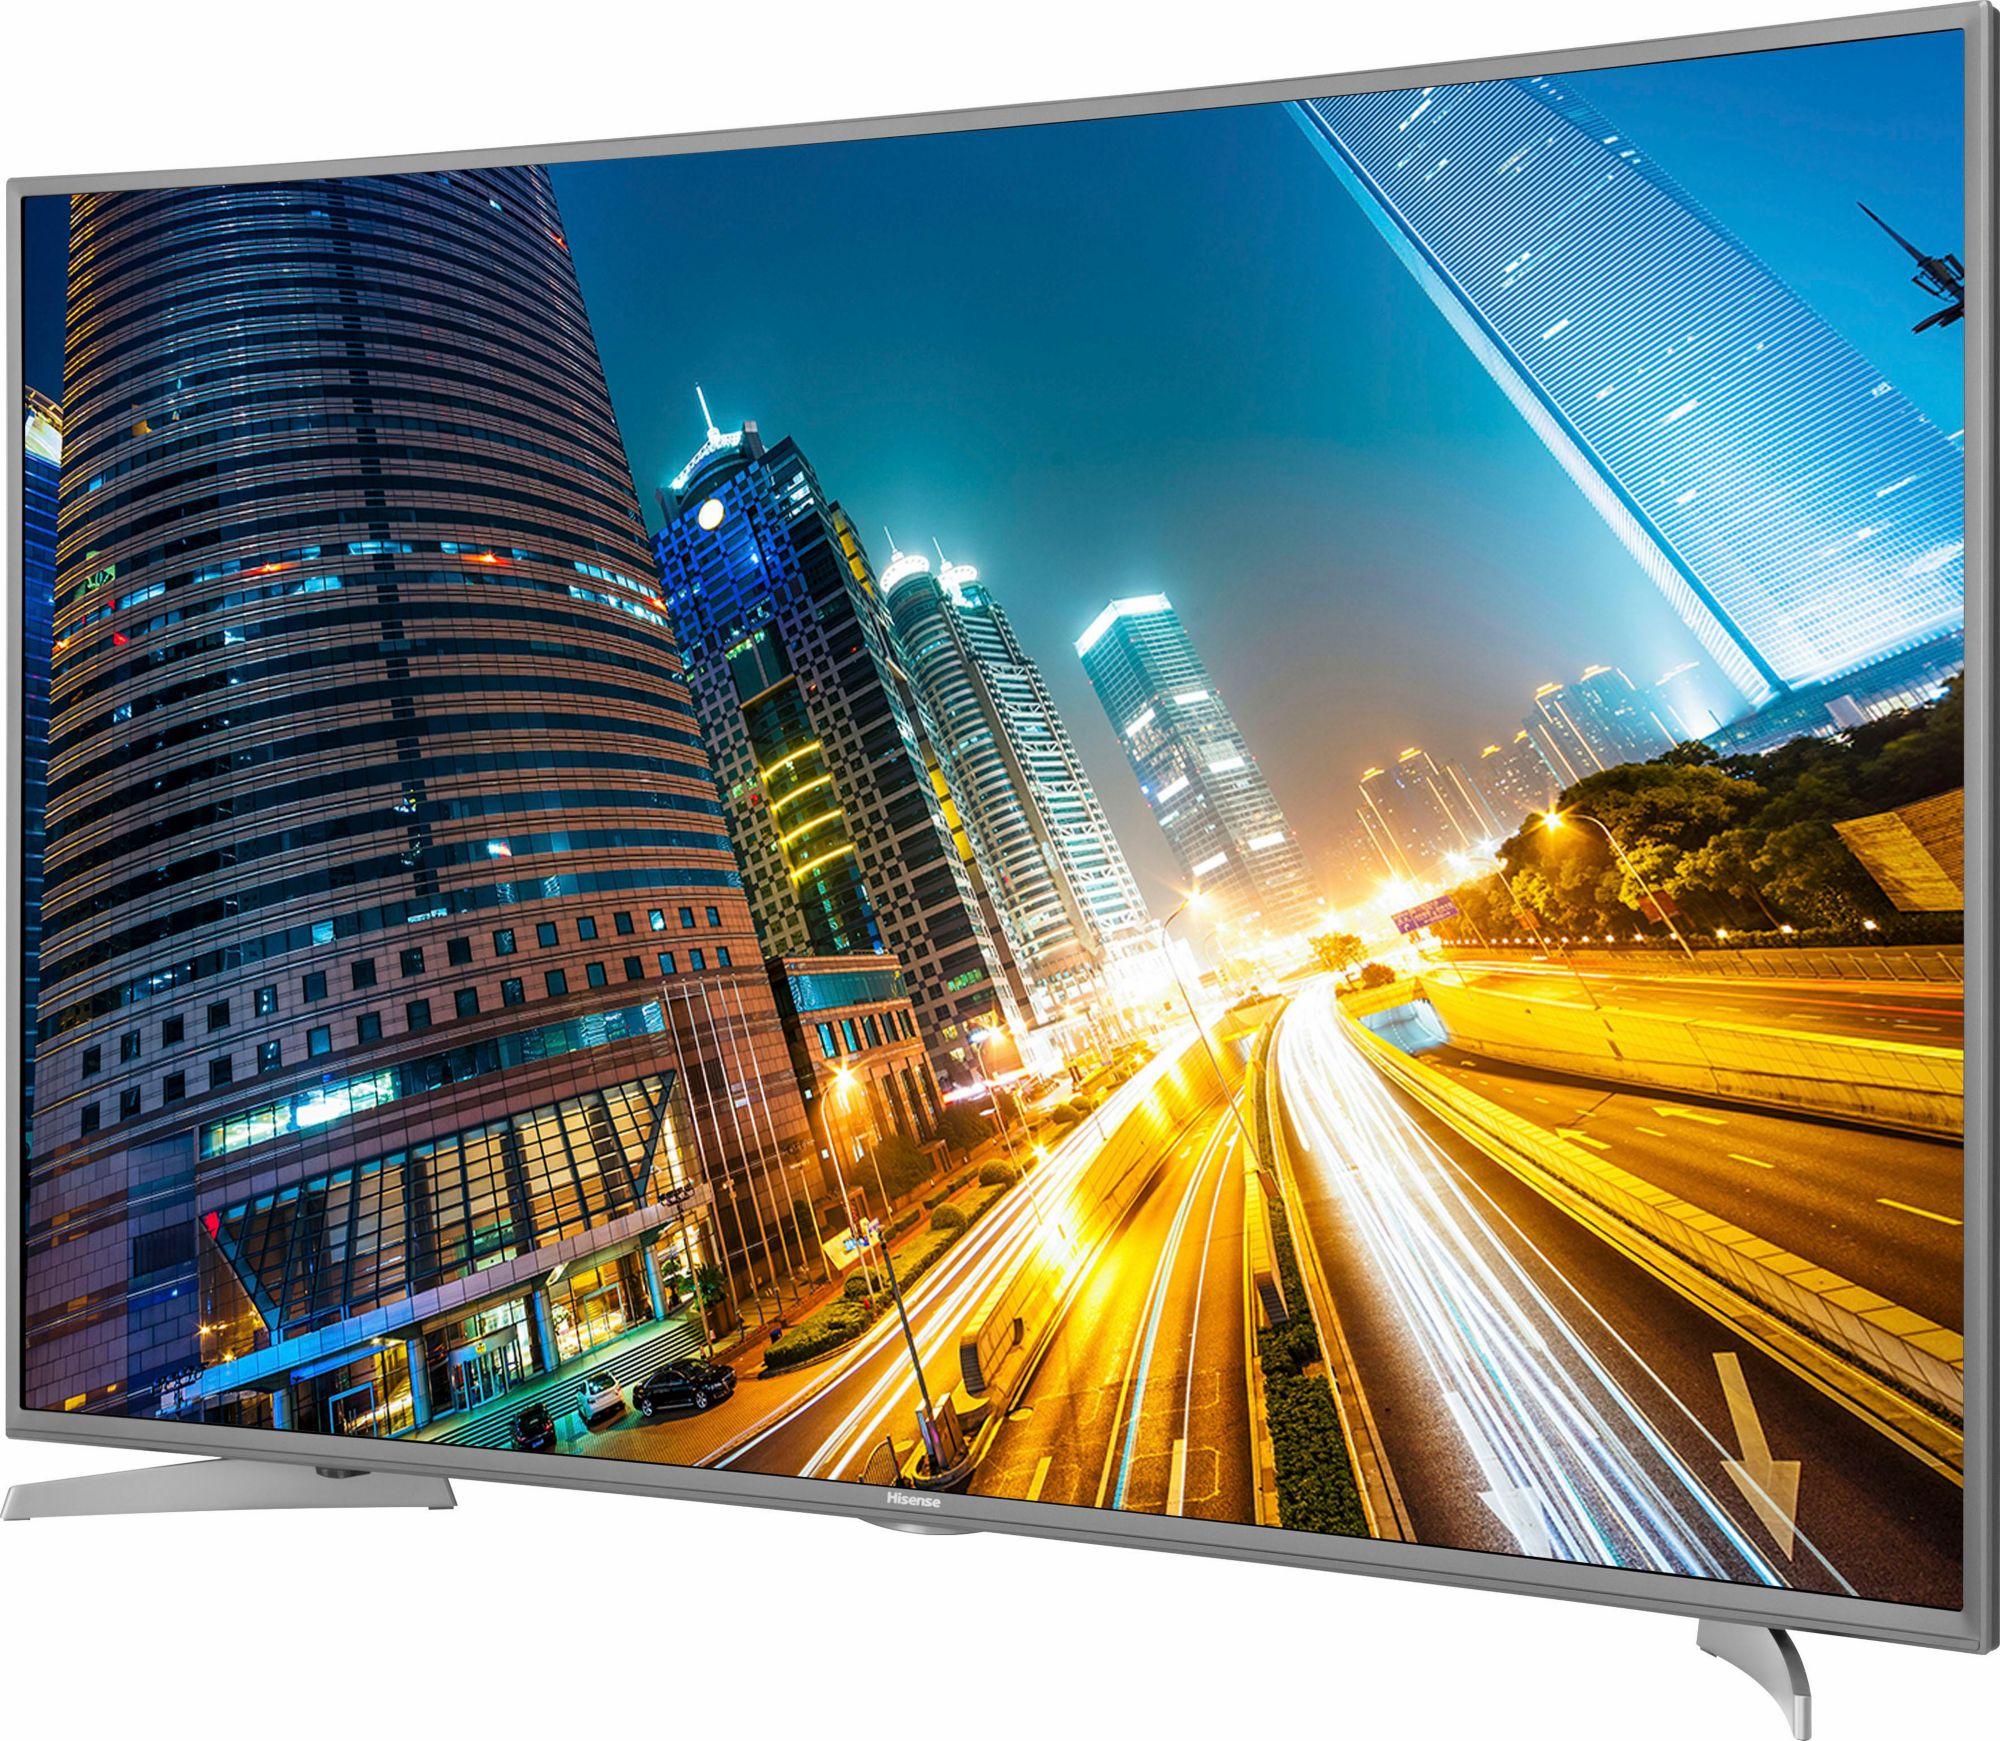 HISENSE Hisense H55MEC5650, Curved-LED-Fernseher, 138 cm (55 Zoll), 2160p (4K Ultra HD), Smart-TV